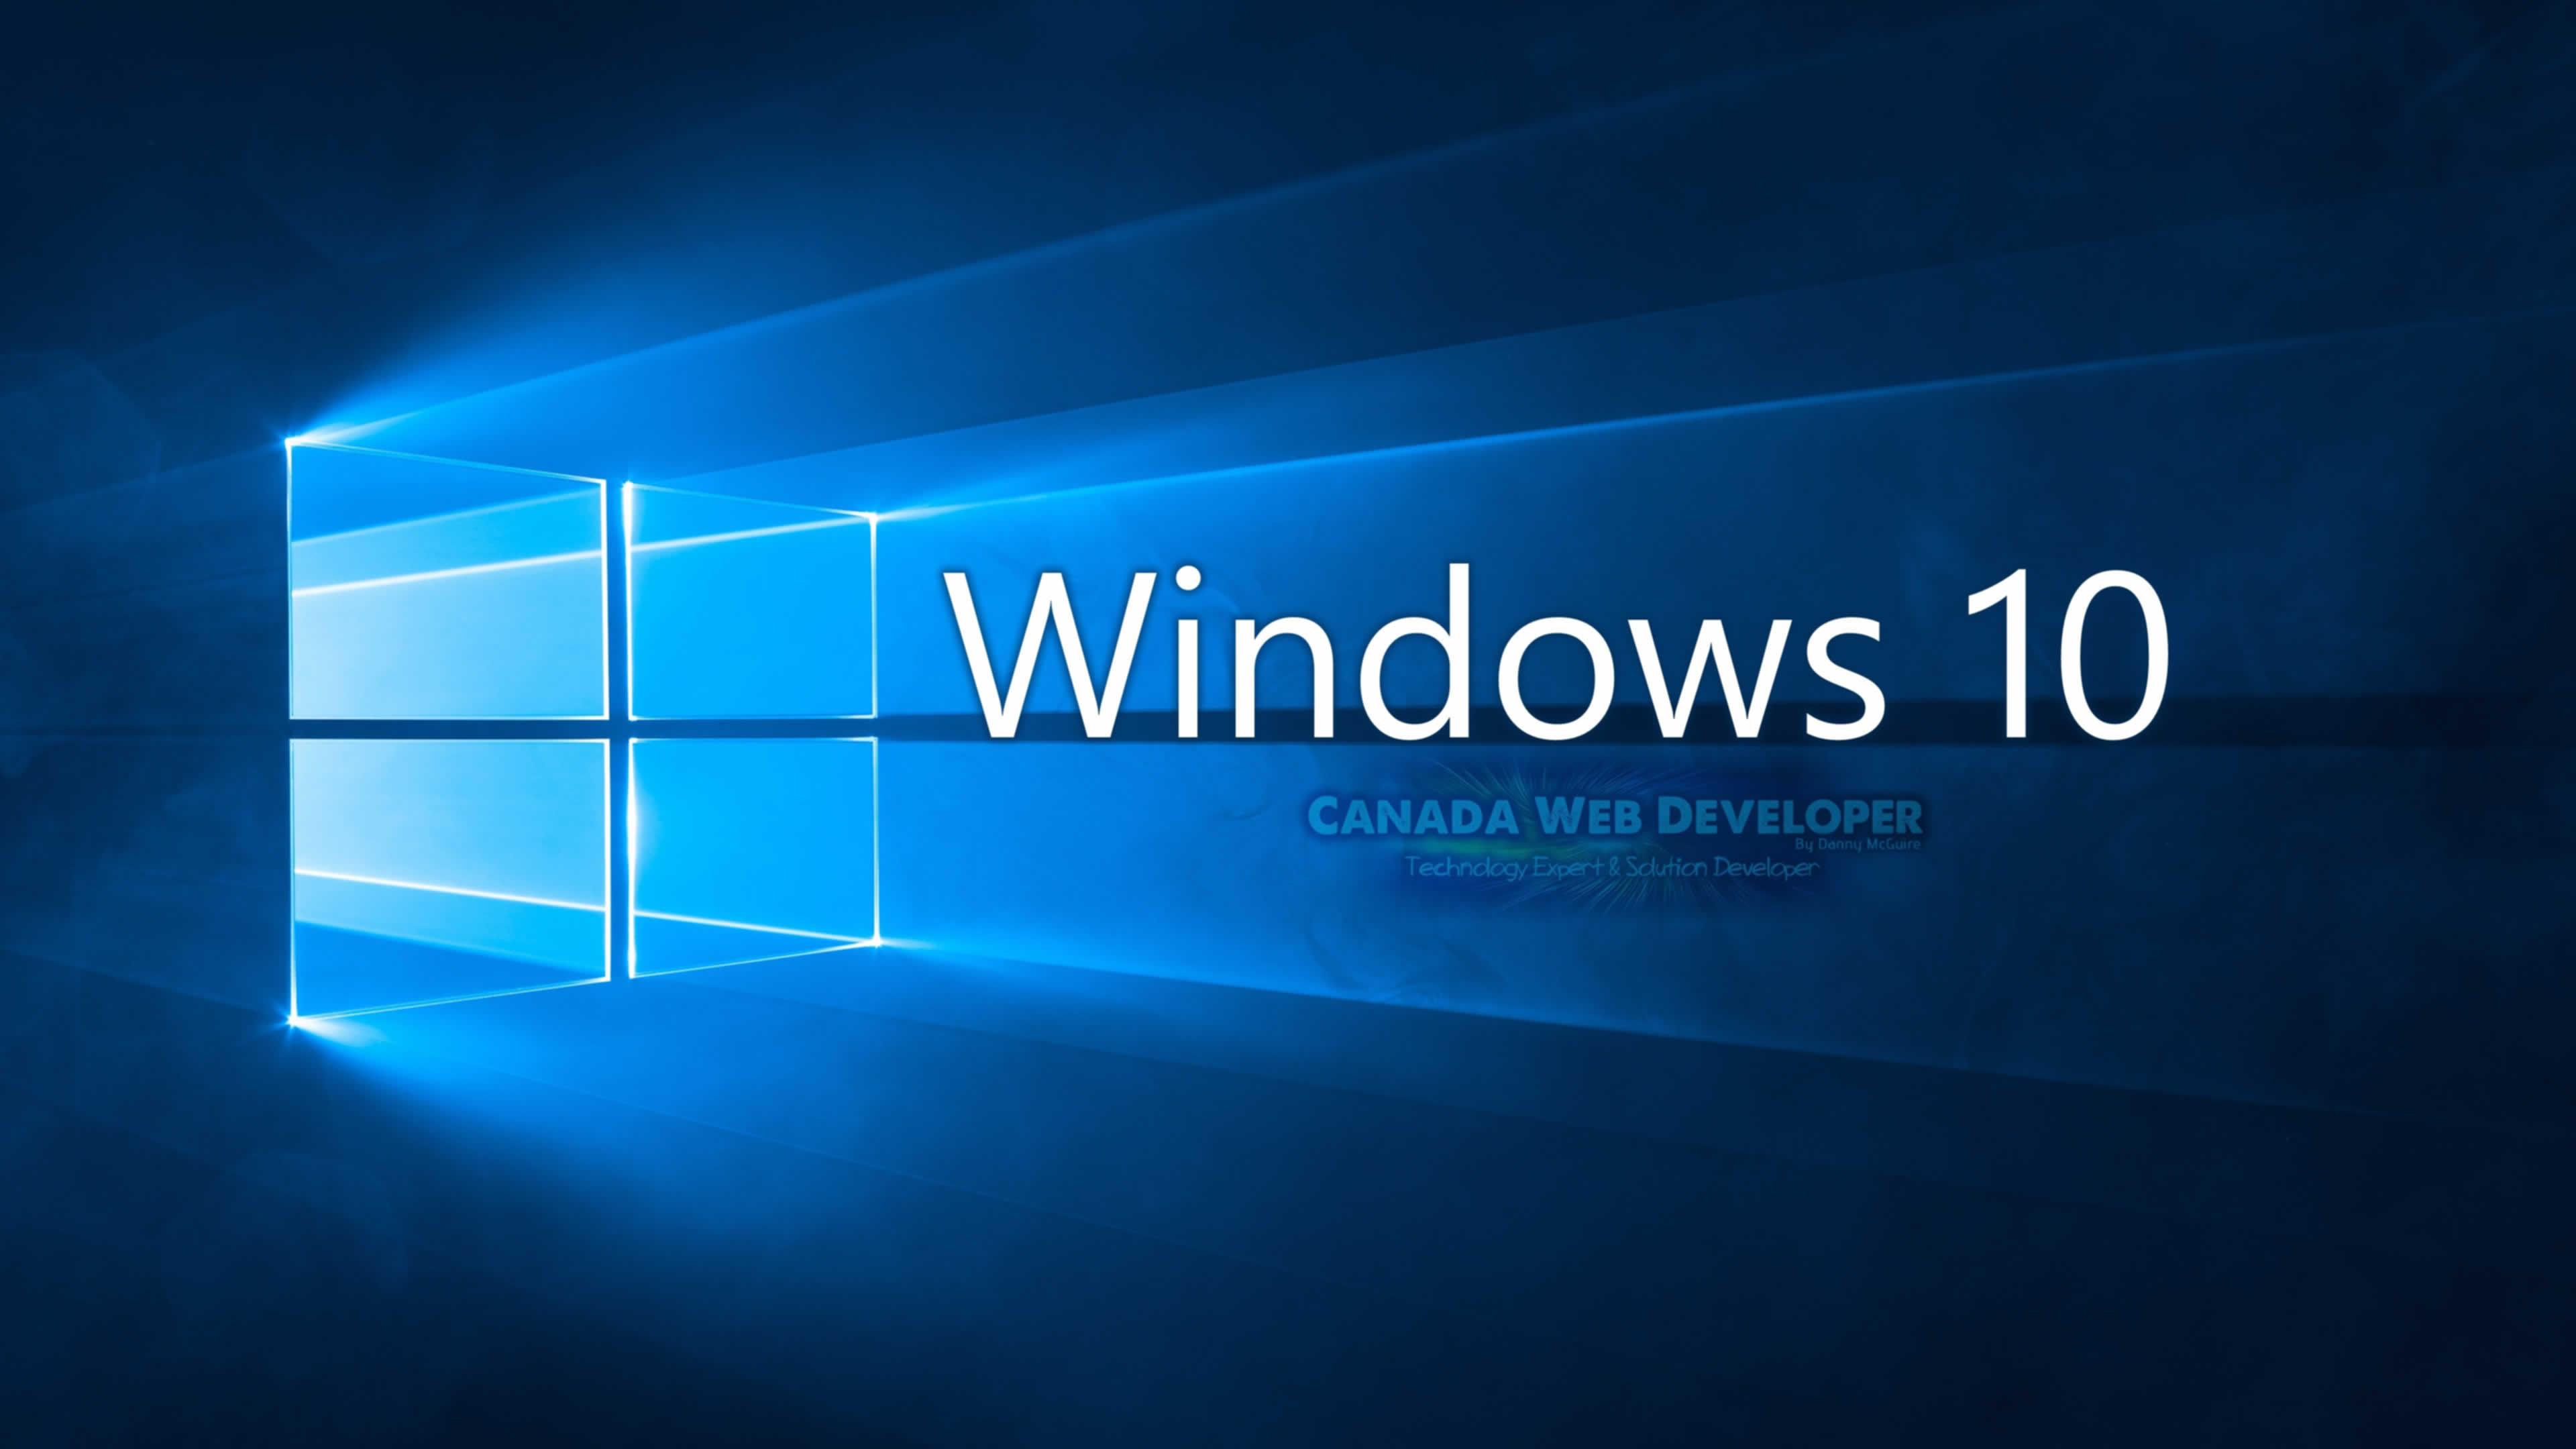 Windows 10 pro wallpaper wallpapersafari for Windows 10 pro